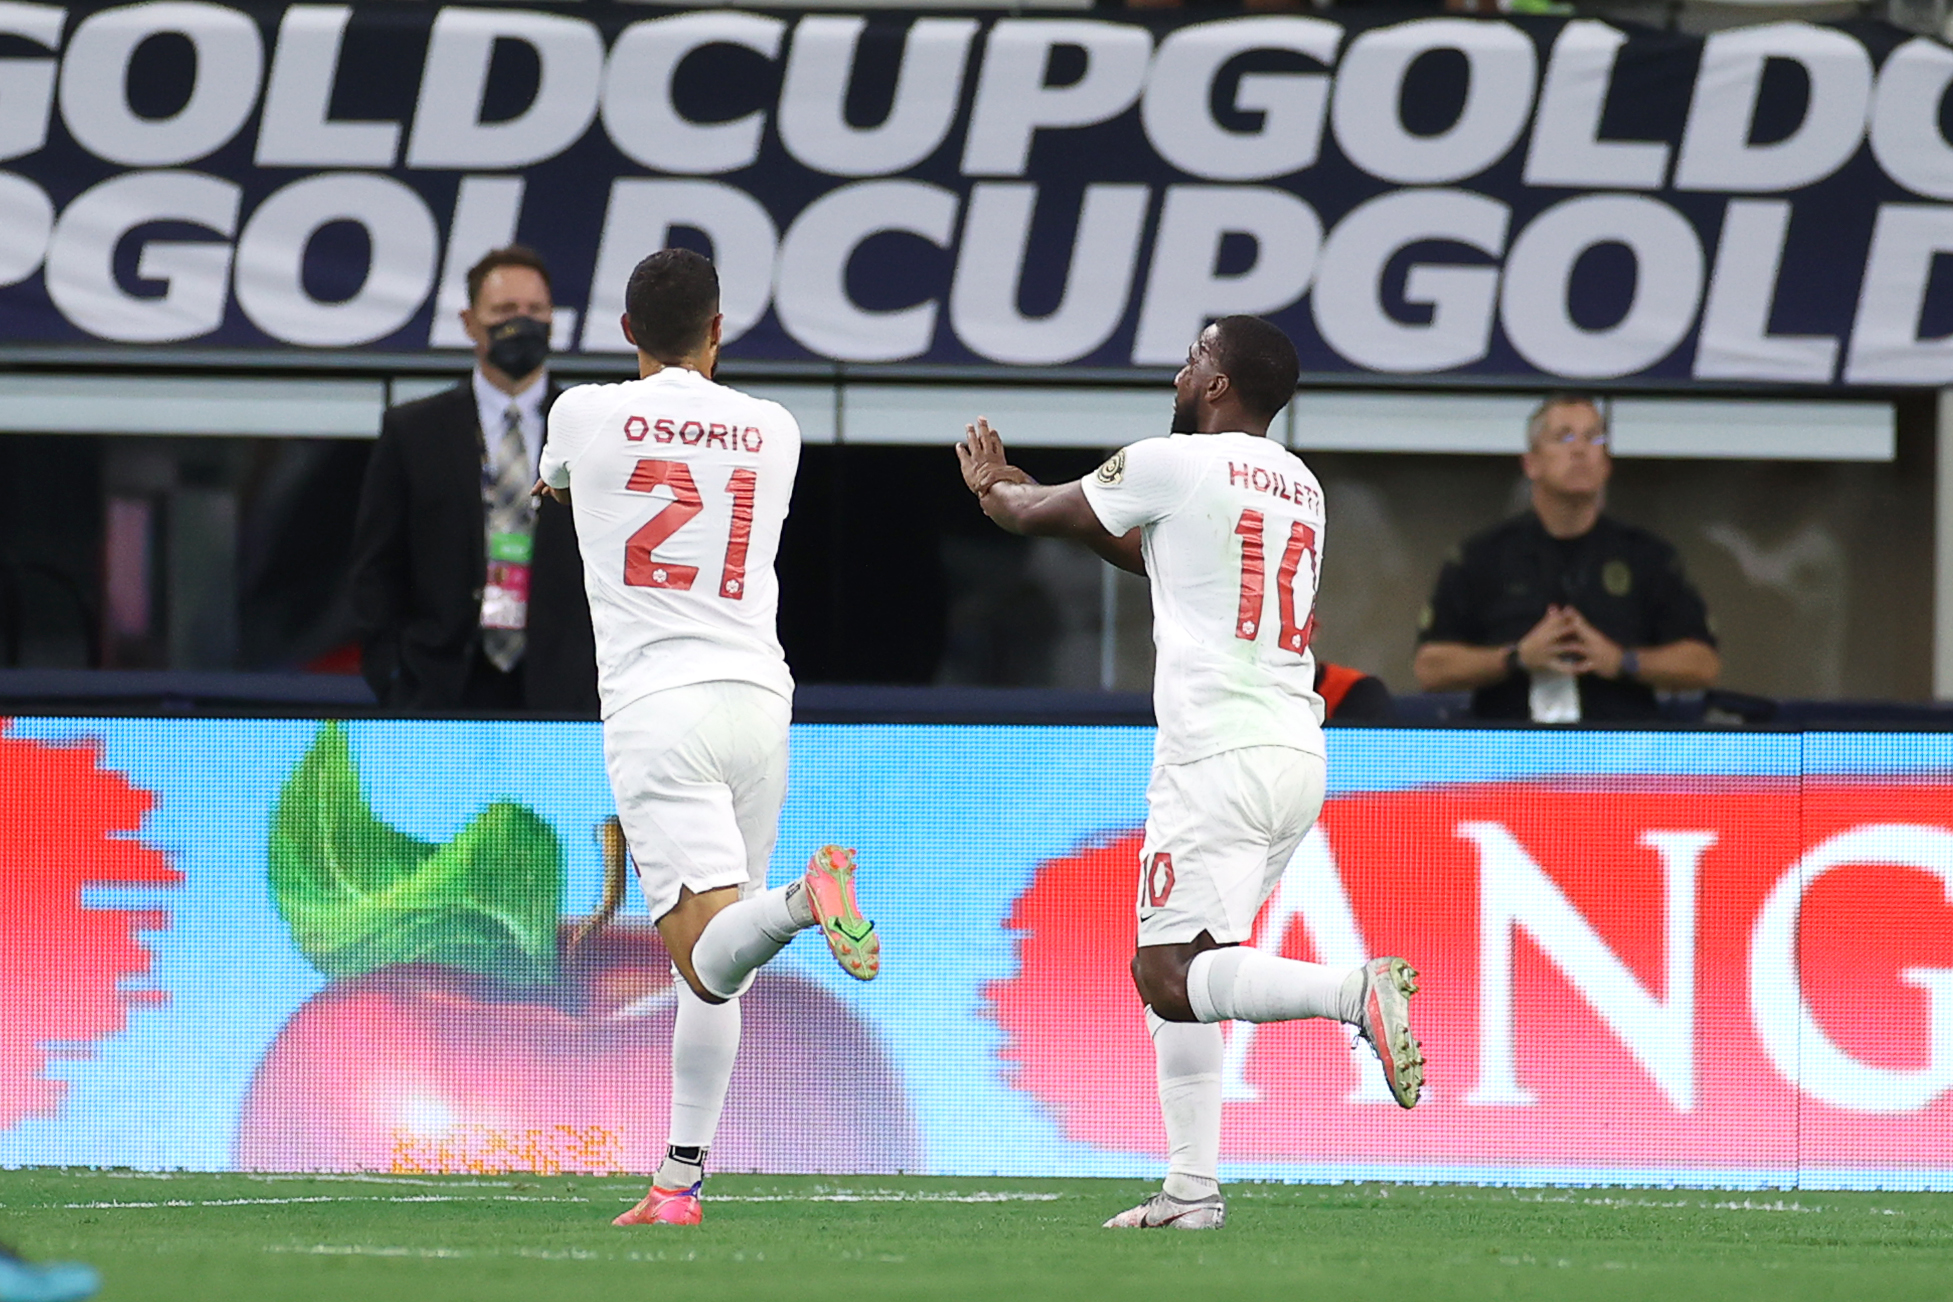 SOCCER: JUL 25 Concacaf Gold Cup Quarterfinal - Costa Rica v Canada